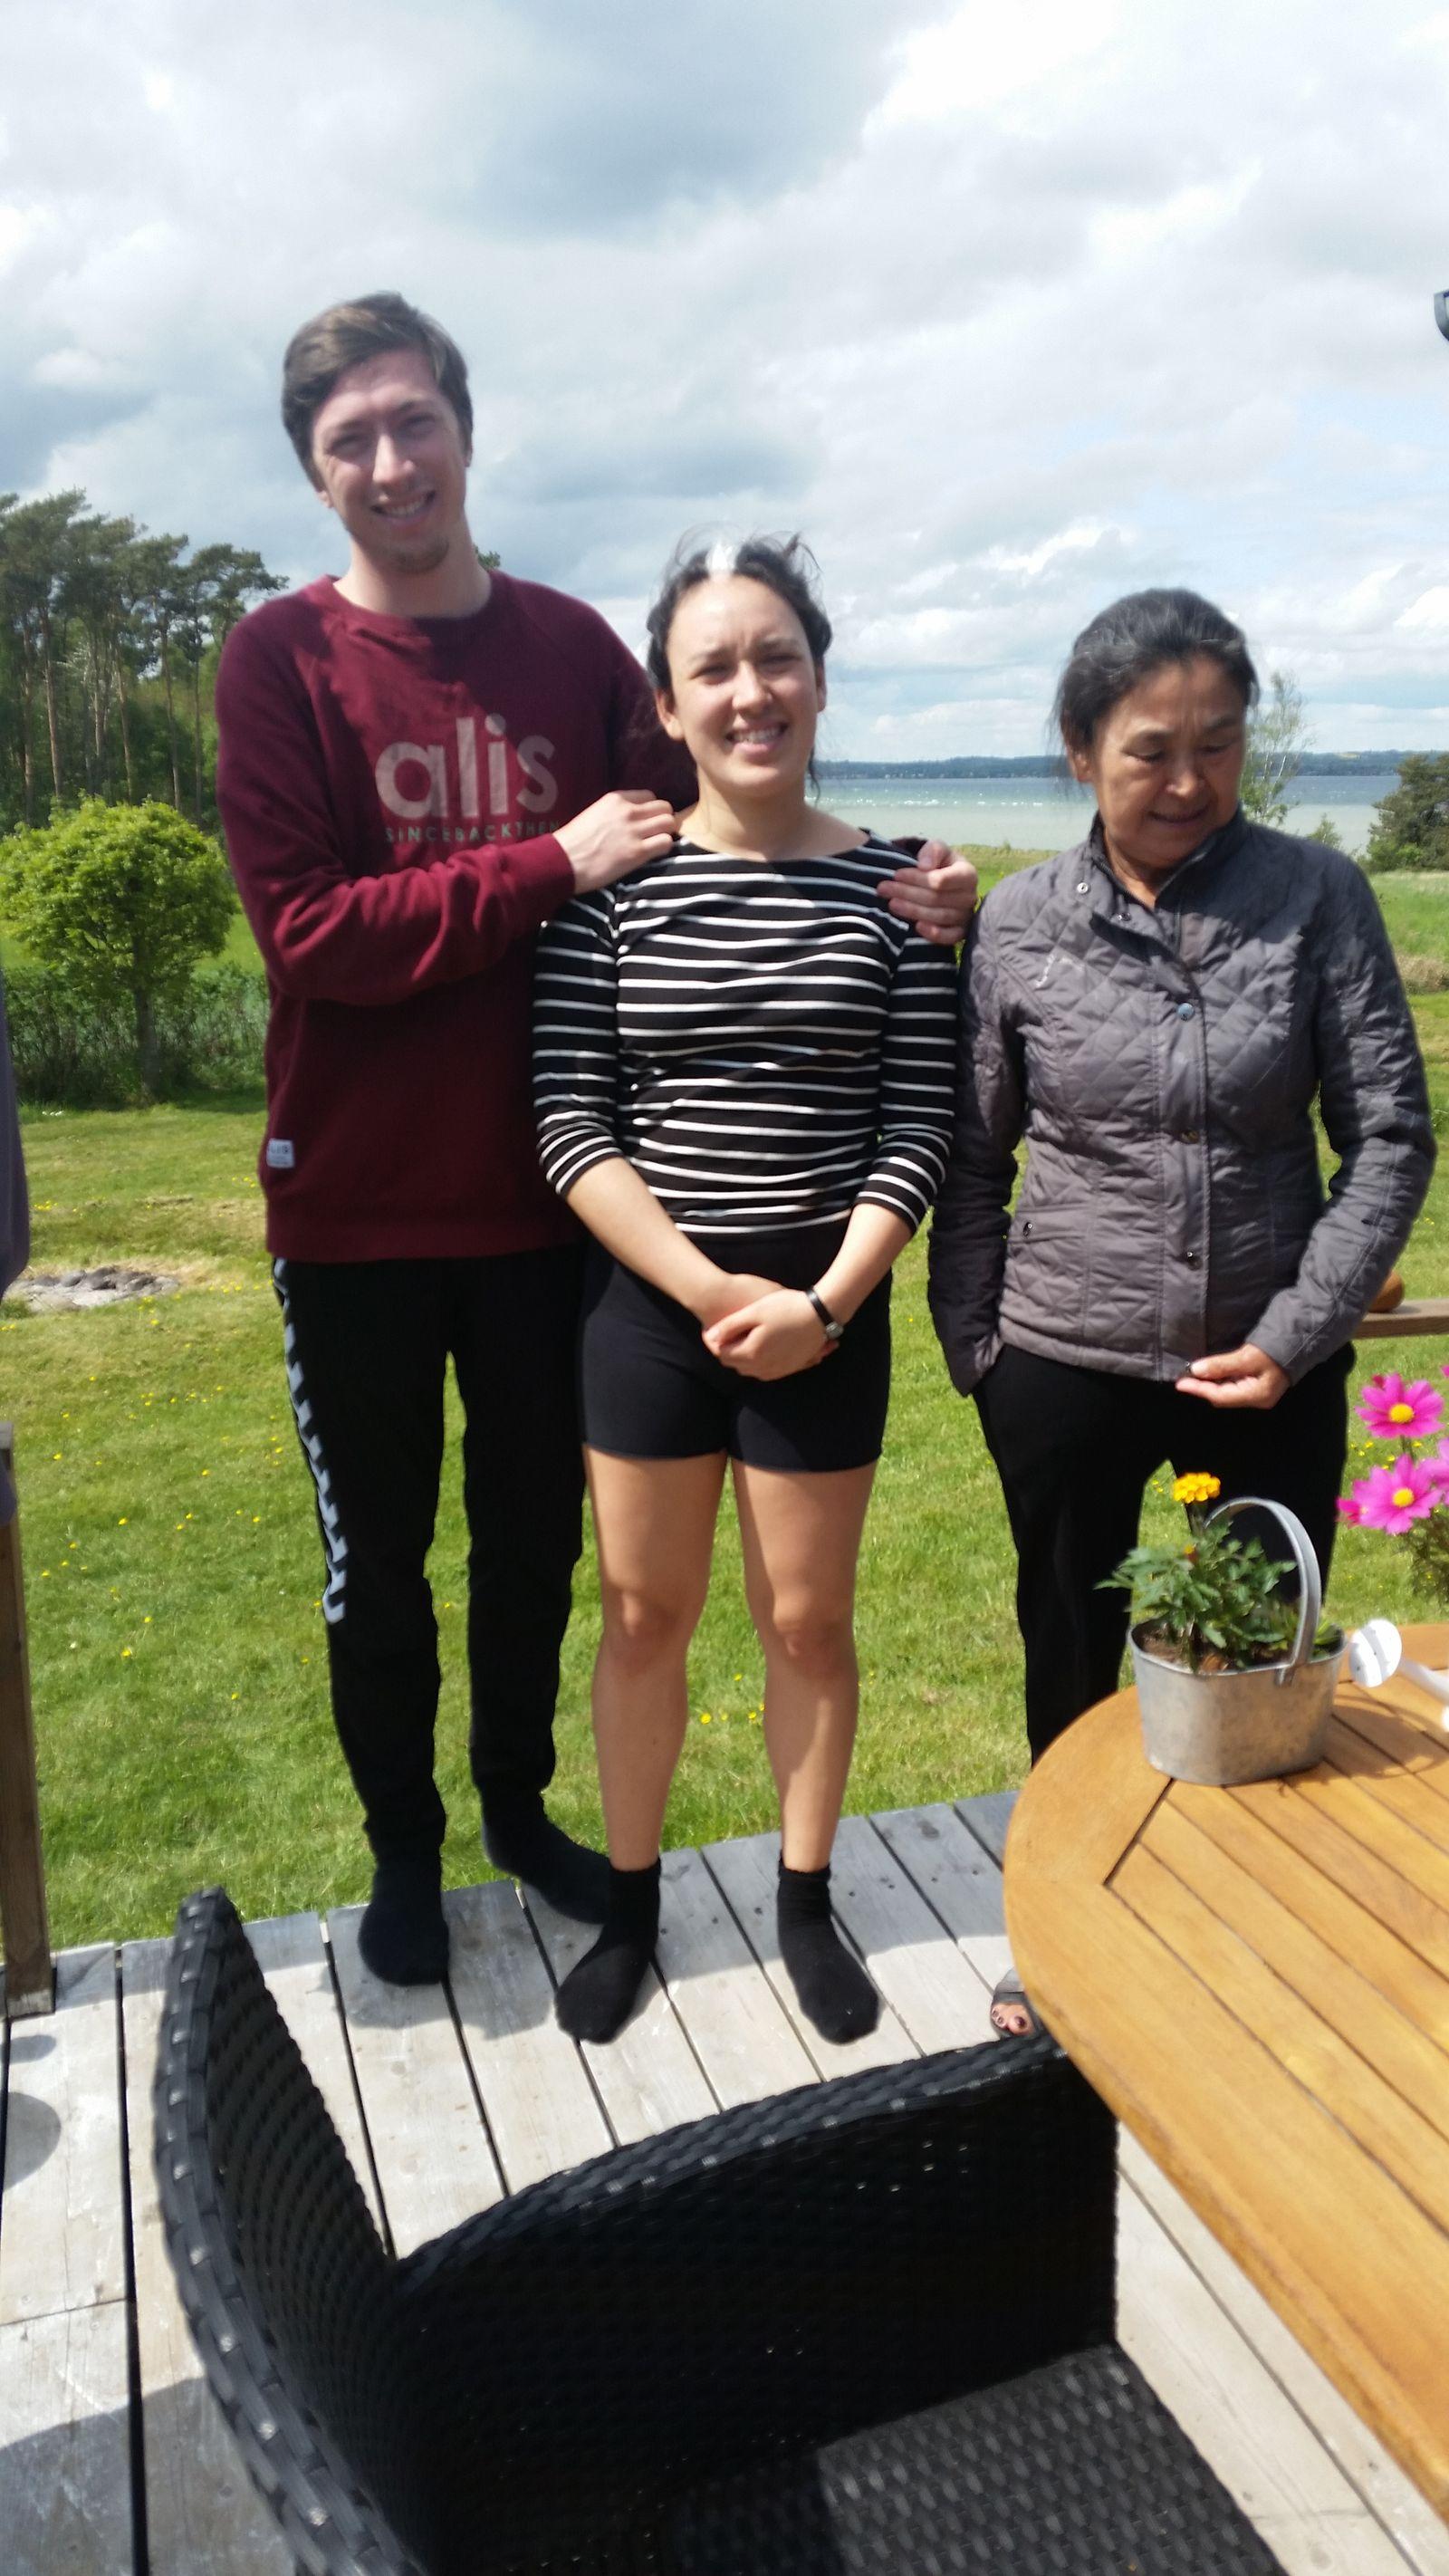 2016-05-14-1338_-_ivalo_lynge_labansen__martha_labansen__salik_lings_skifte_2